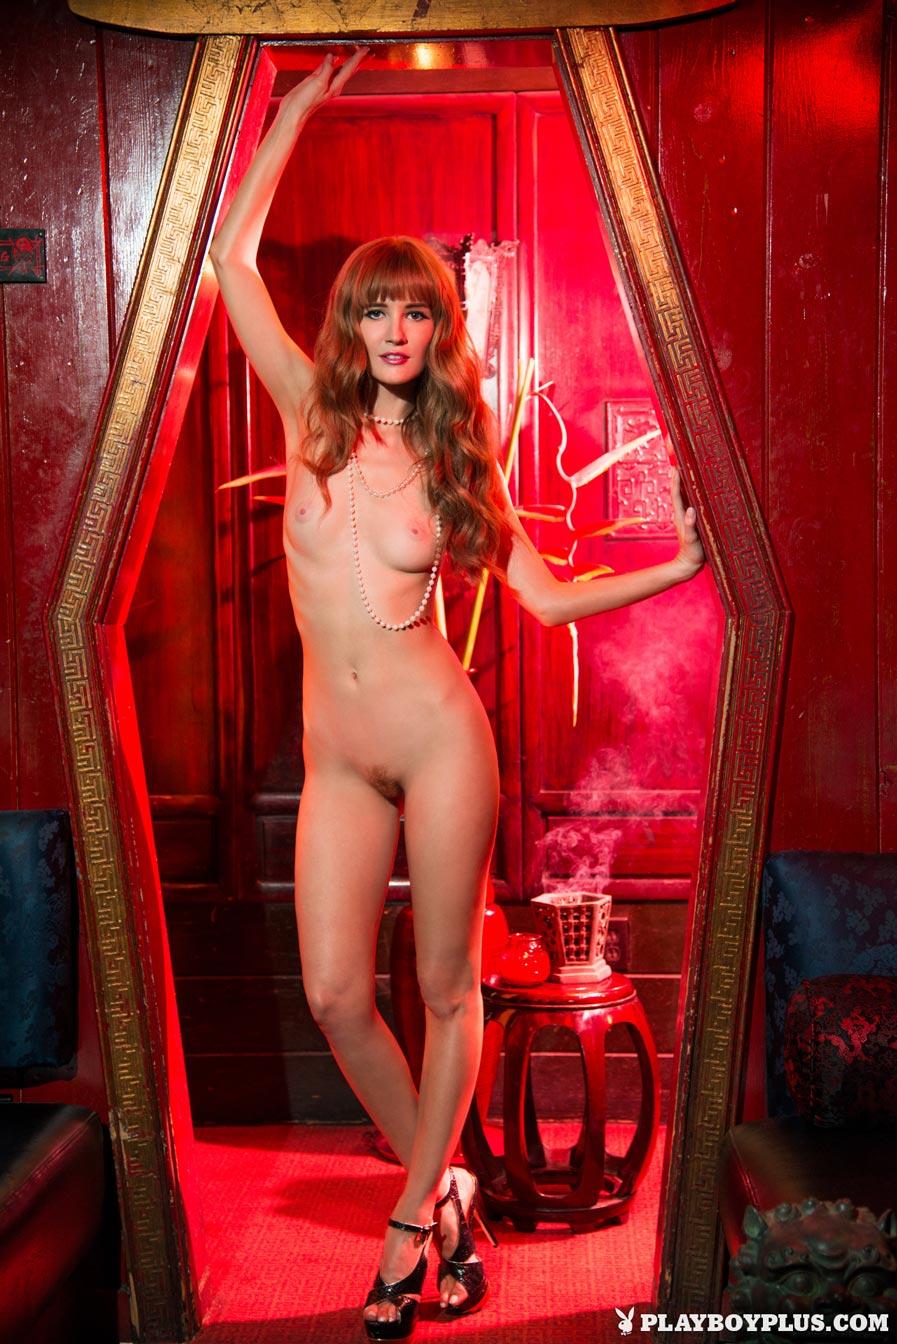 Alyssa arce naked in shower - 1 part 1